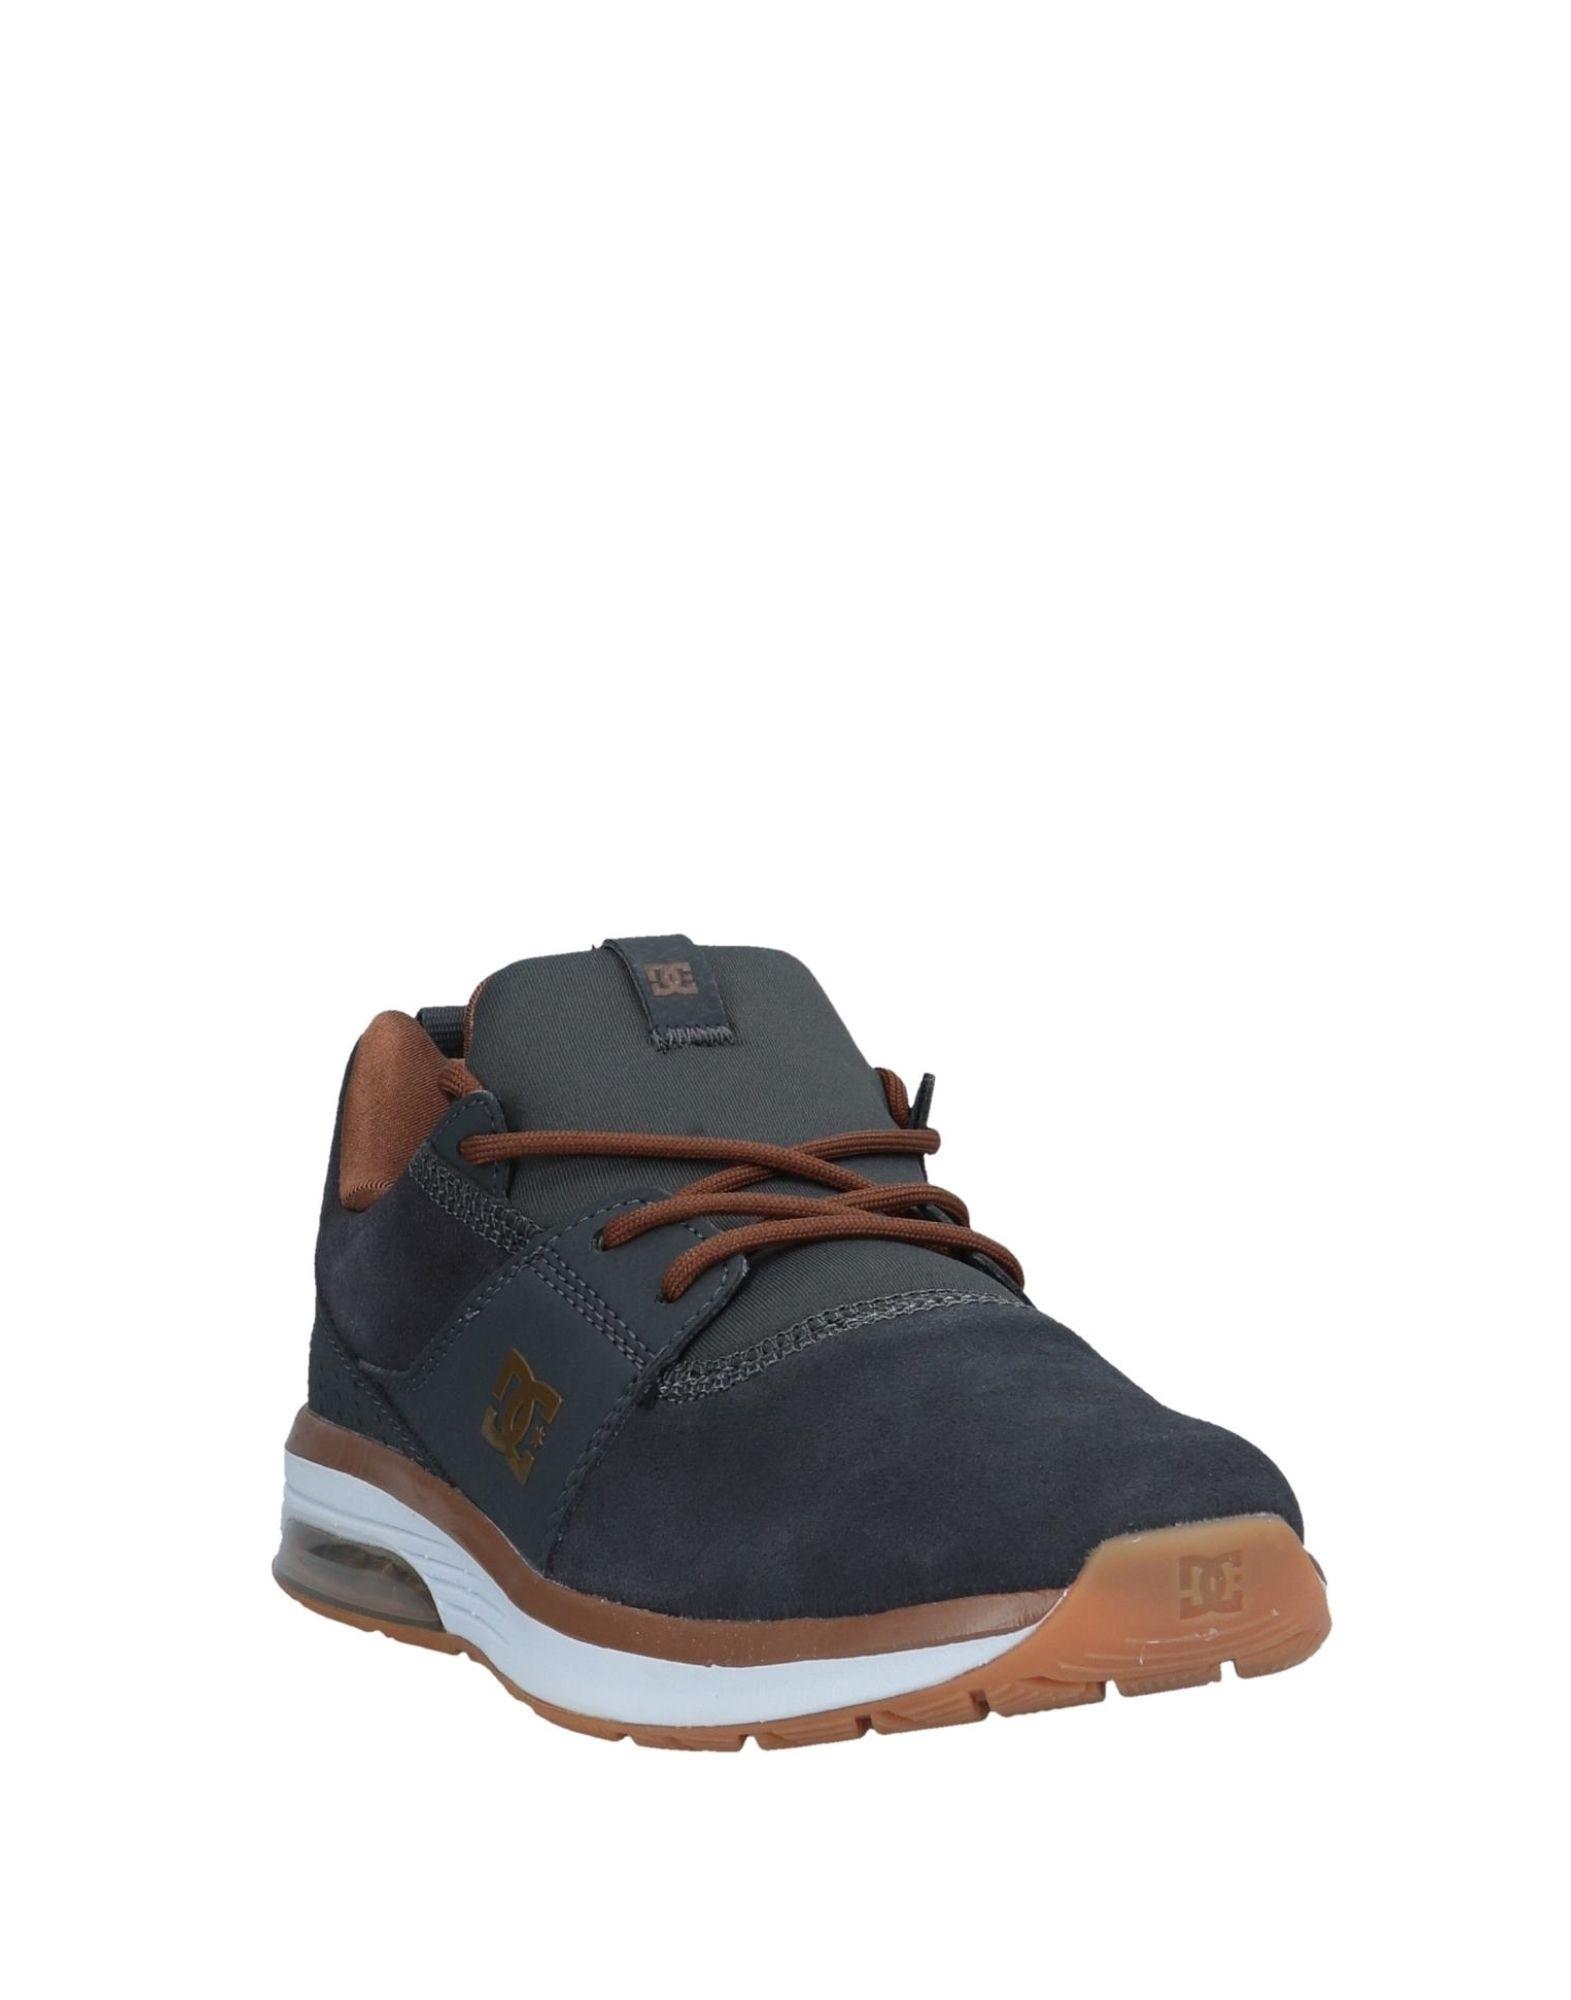 Shoecousa Dc Shoecousa  Sneakers Herren  11556061XN 494423